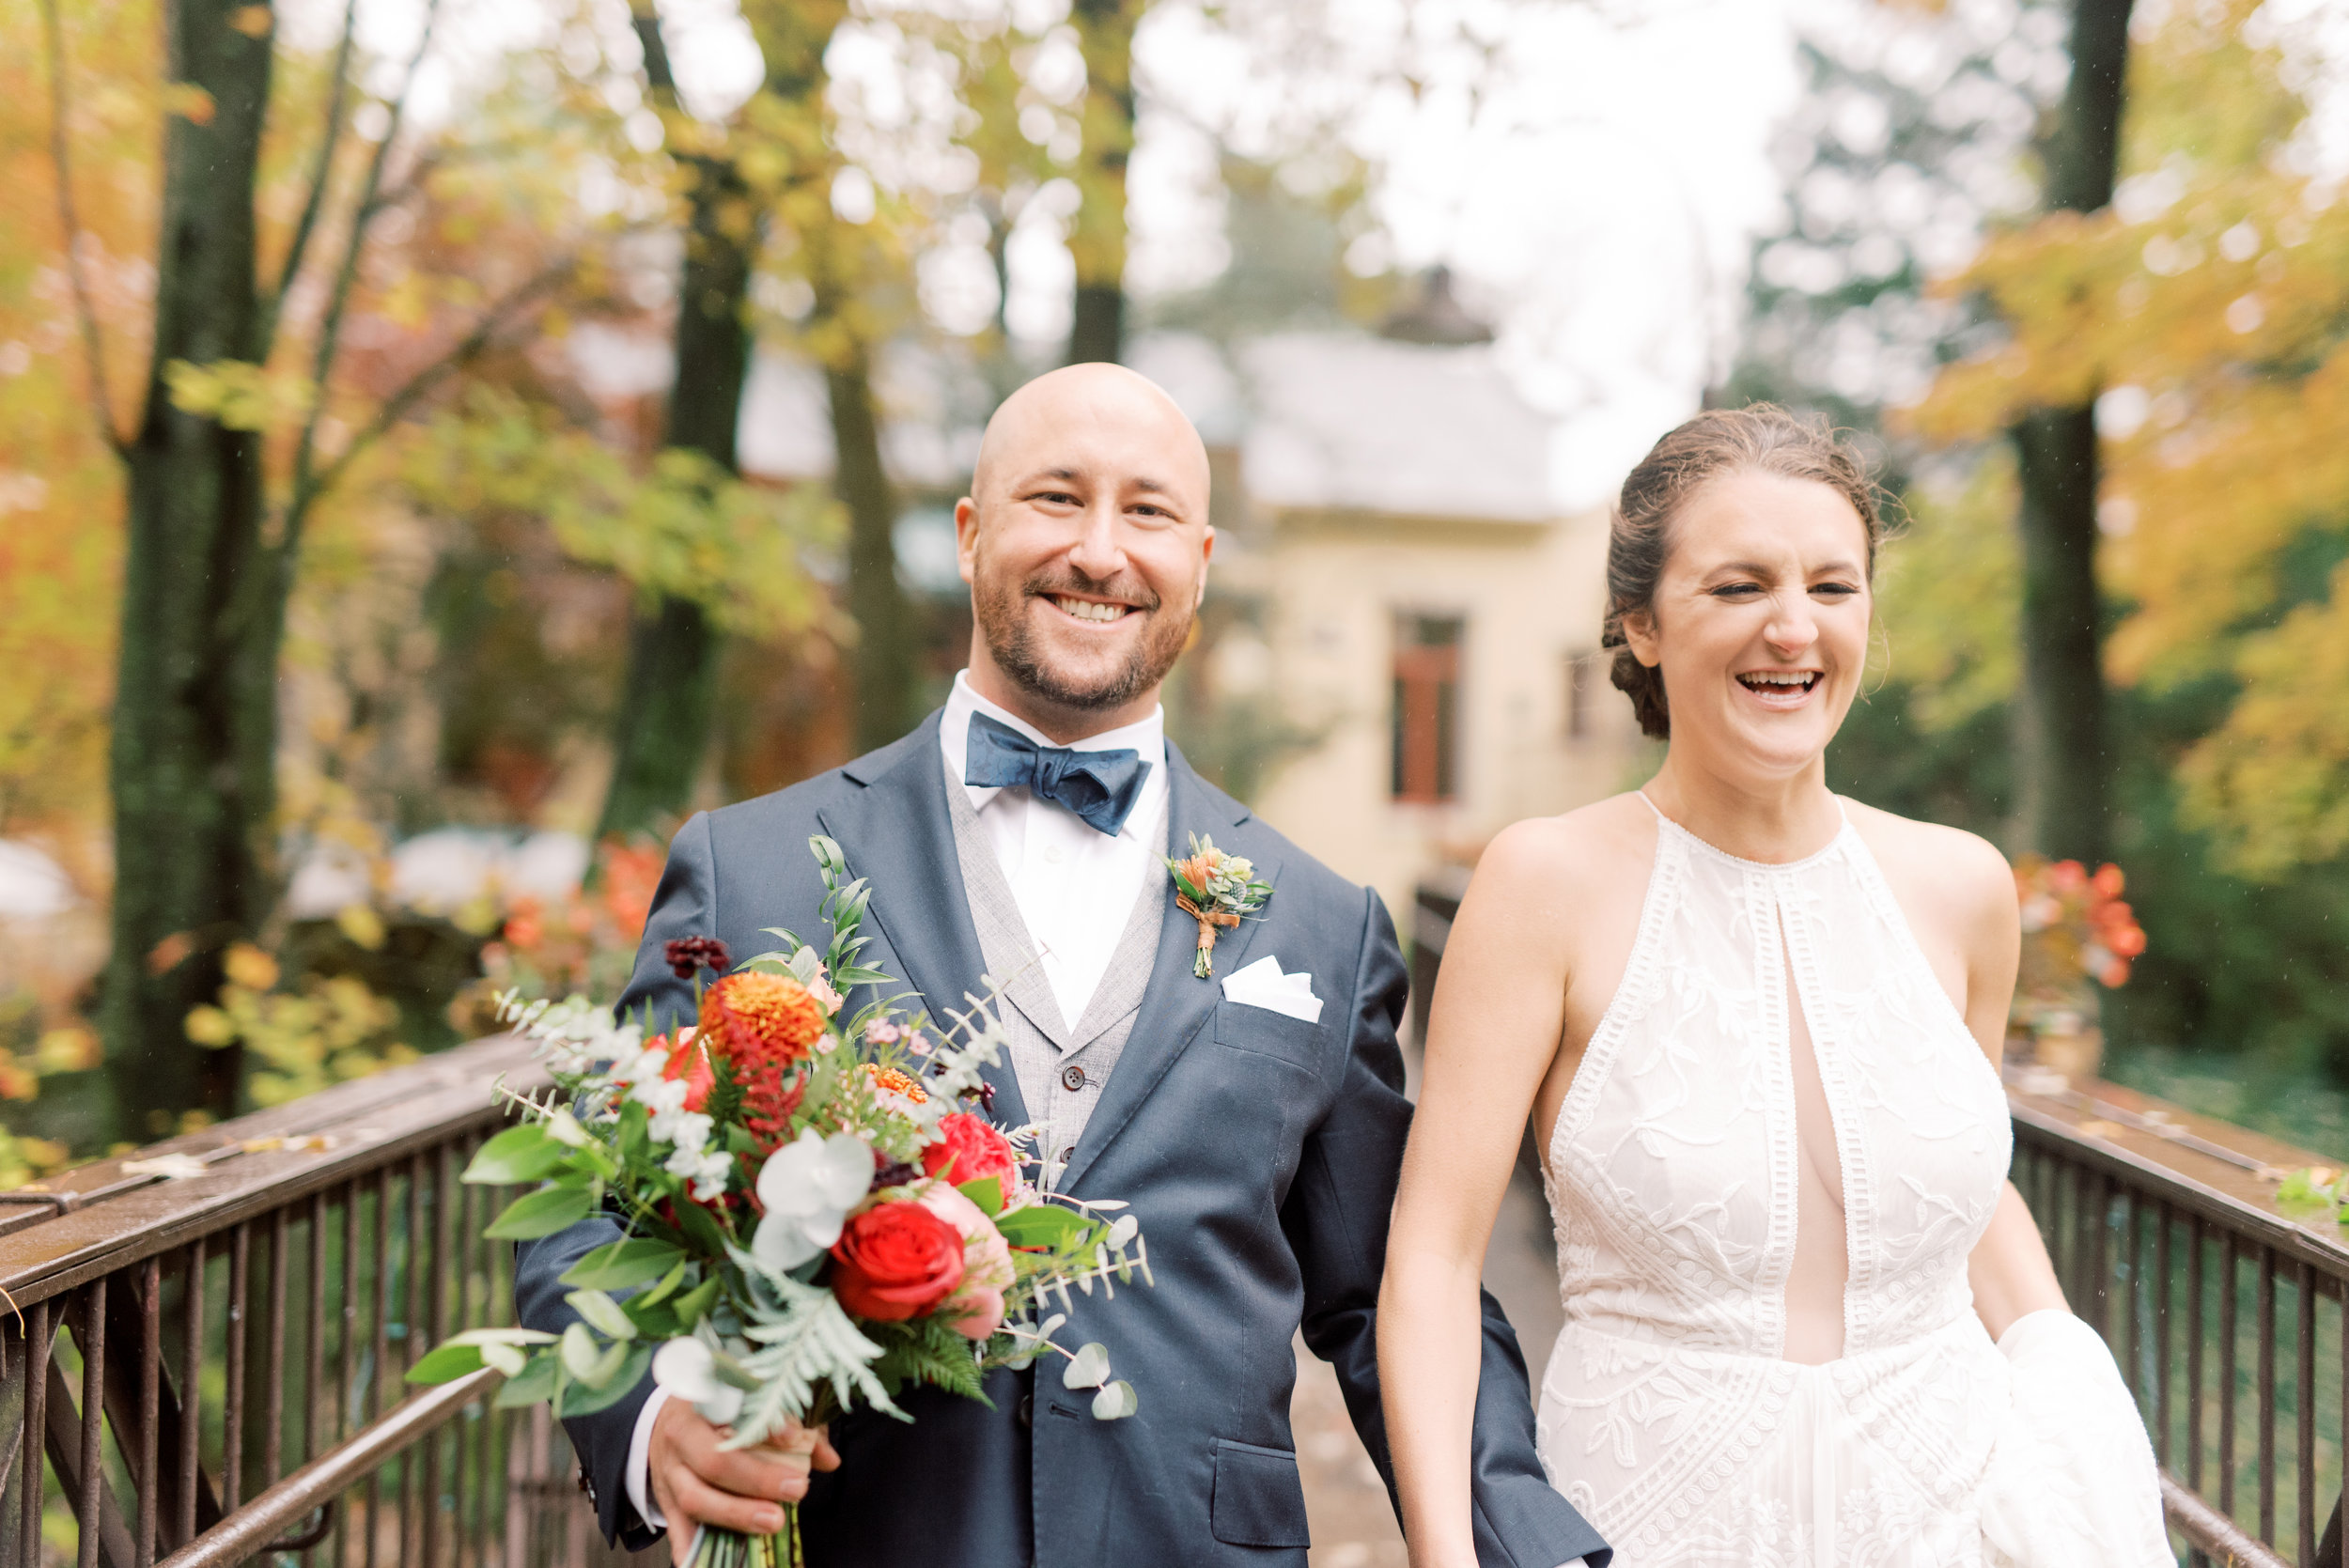 haley-richter-photography-october-pomme-wedding-in-radnor-054.jpg